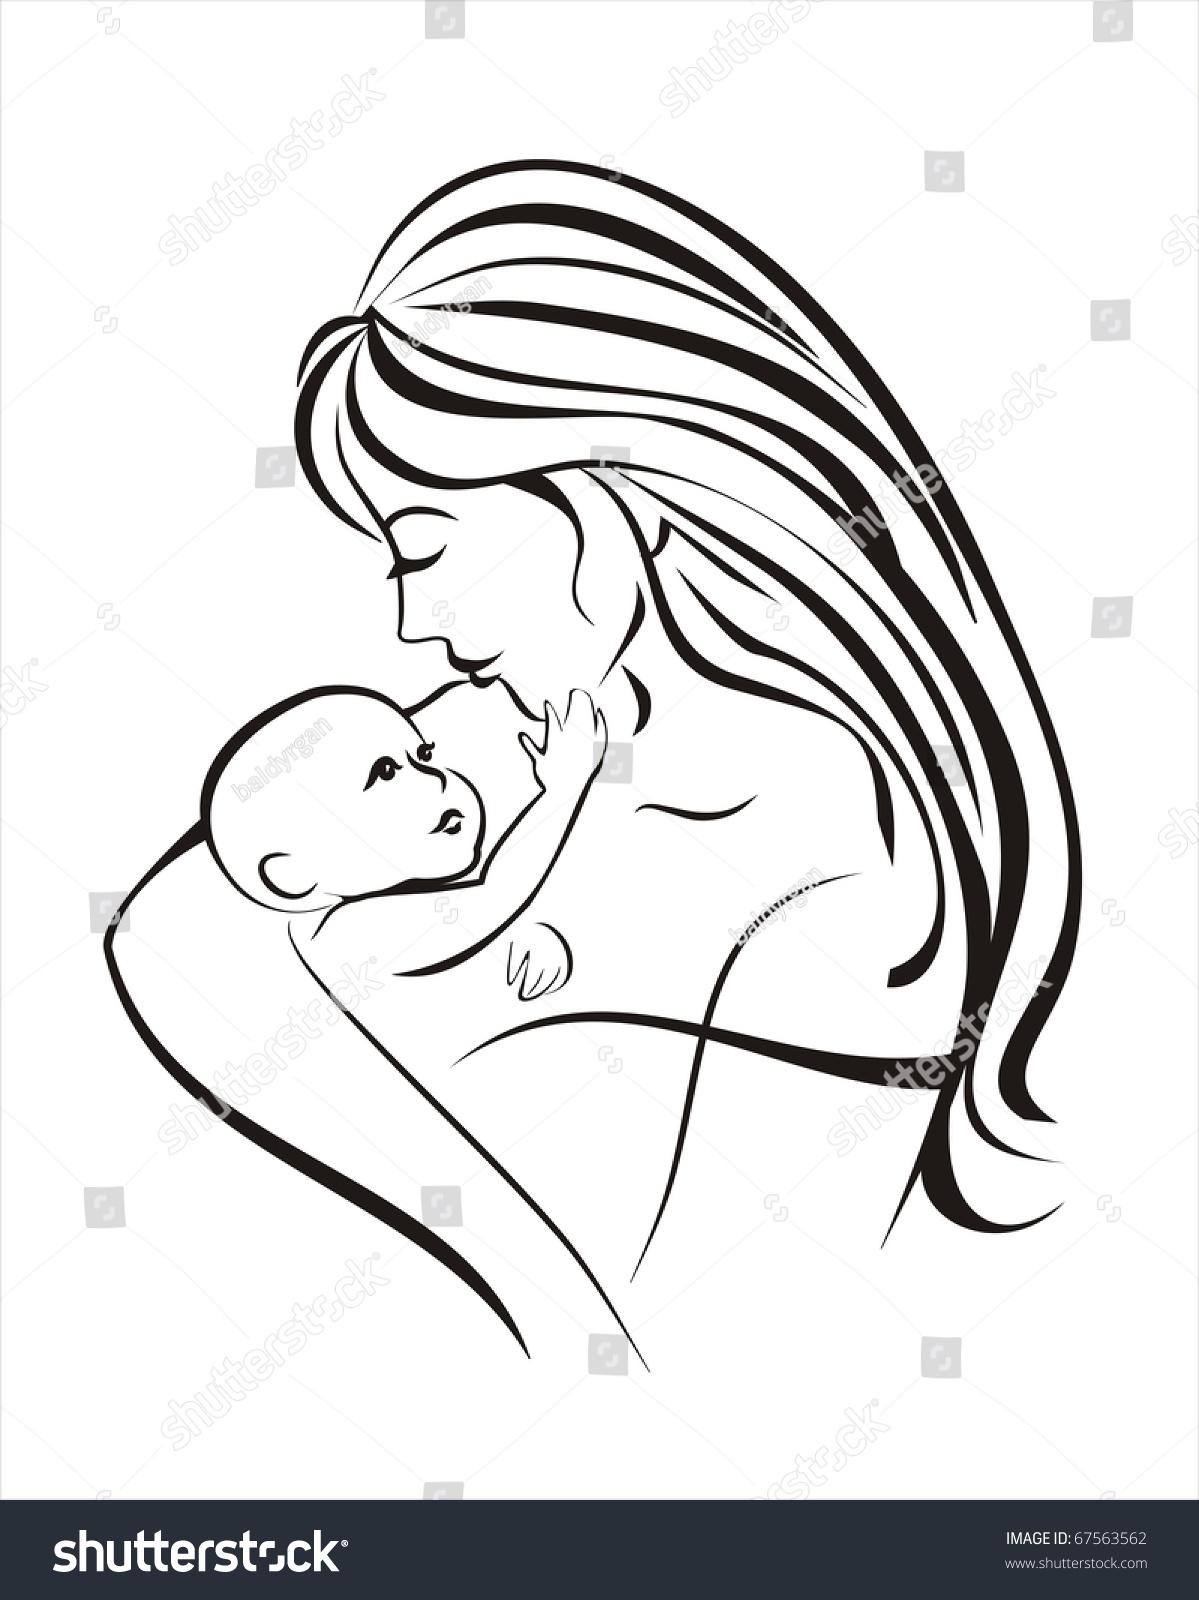 Mother Child Vector Sketch Black Lines Stock Vector ...